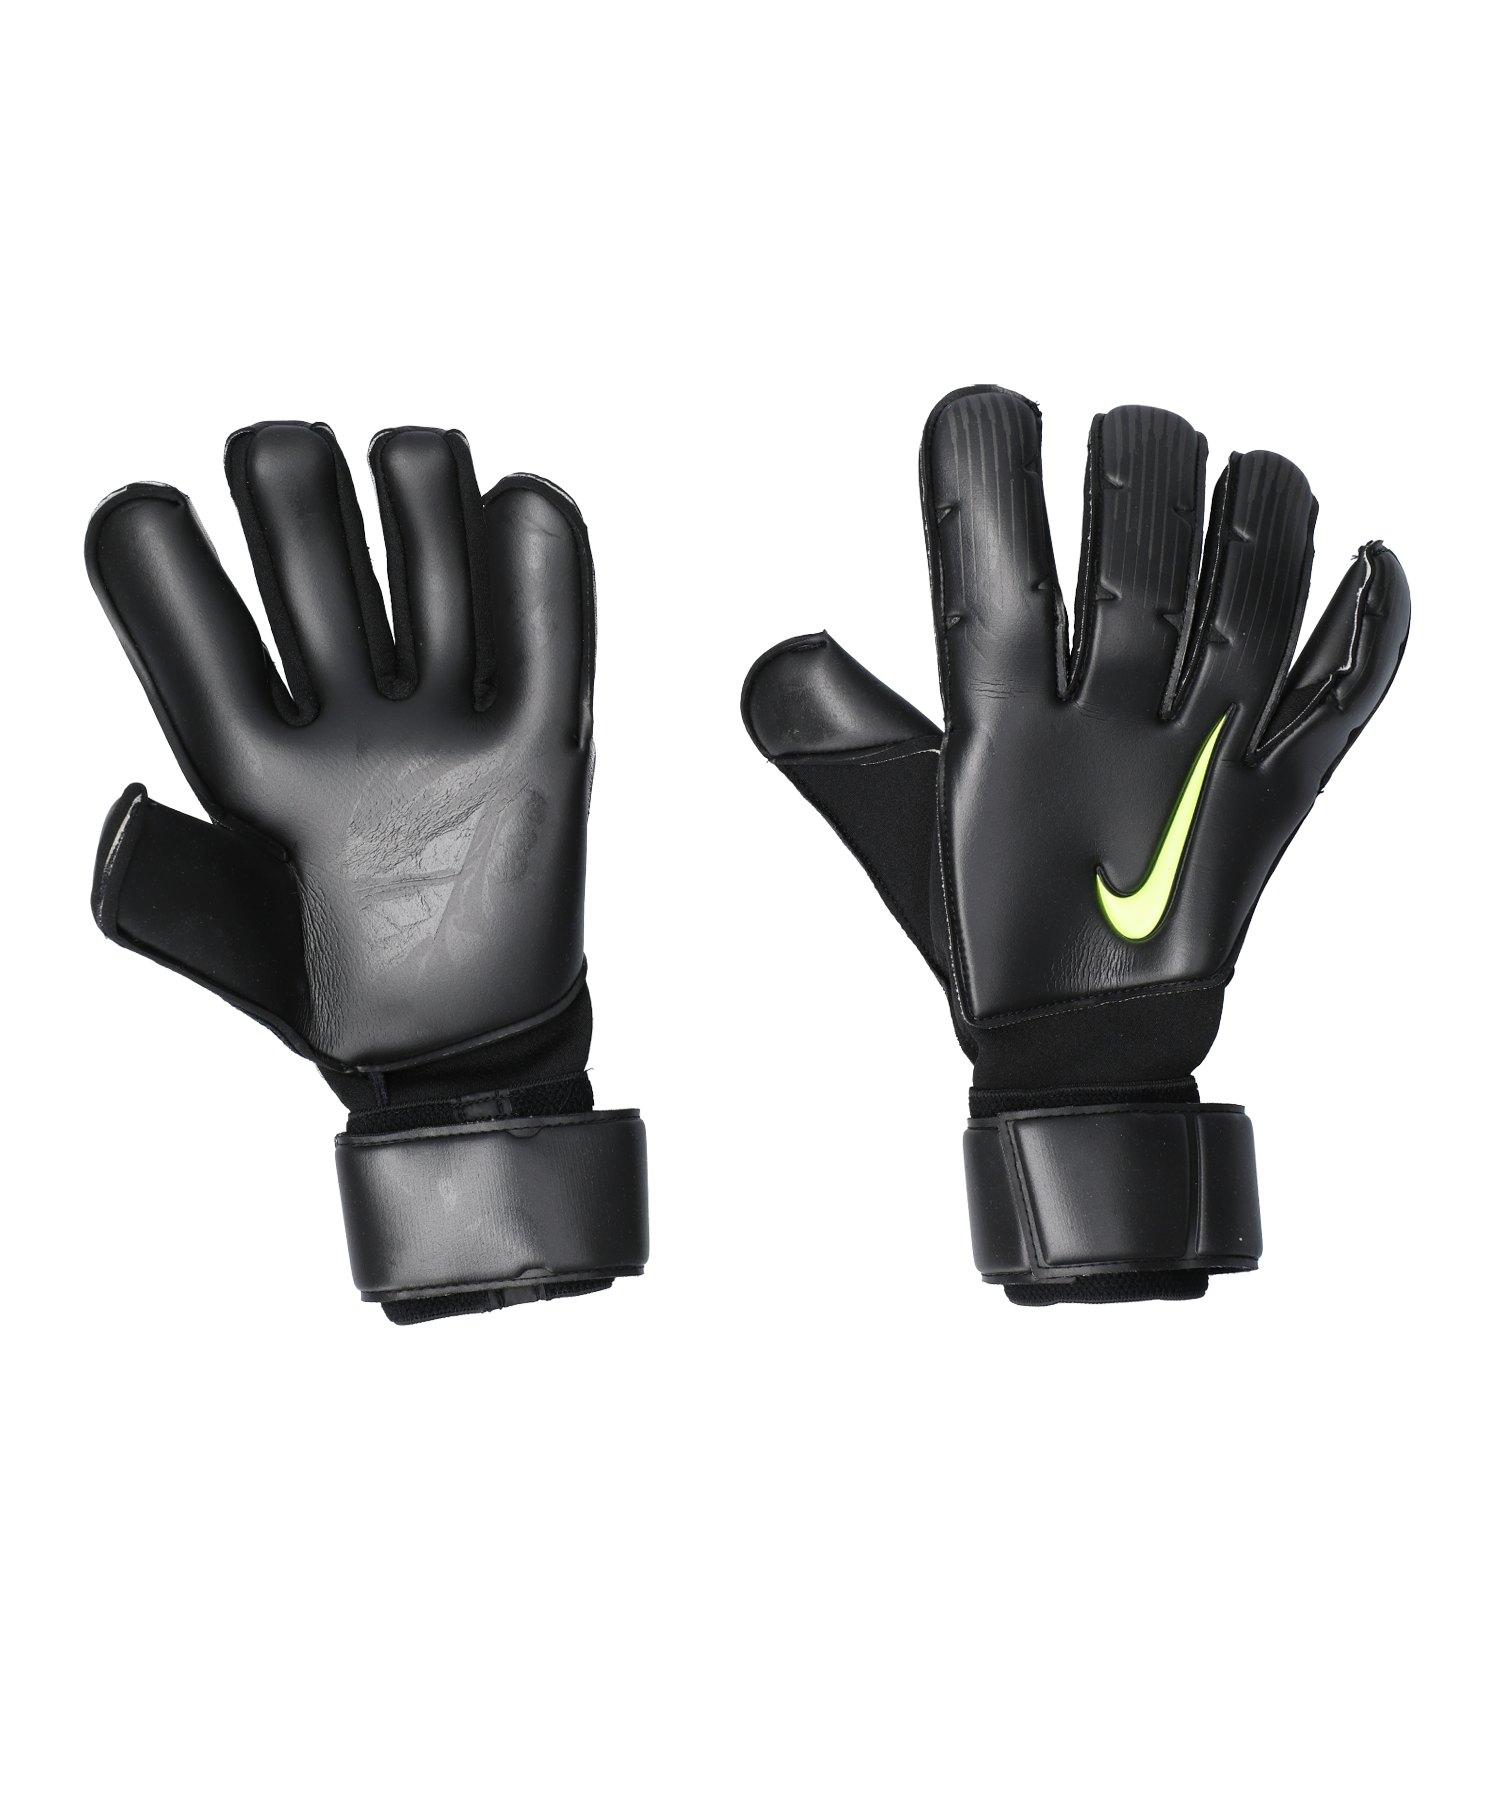 Nike Vapor Grip 3 Reverse Promo TW-Handschuhe F010 - schwarz